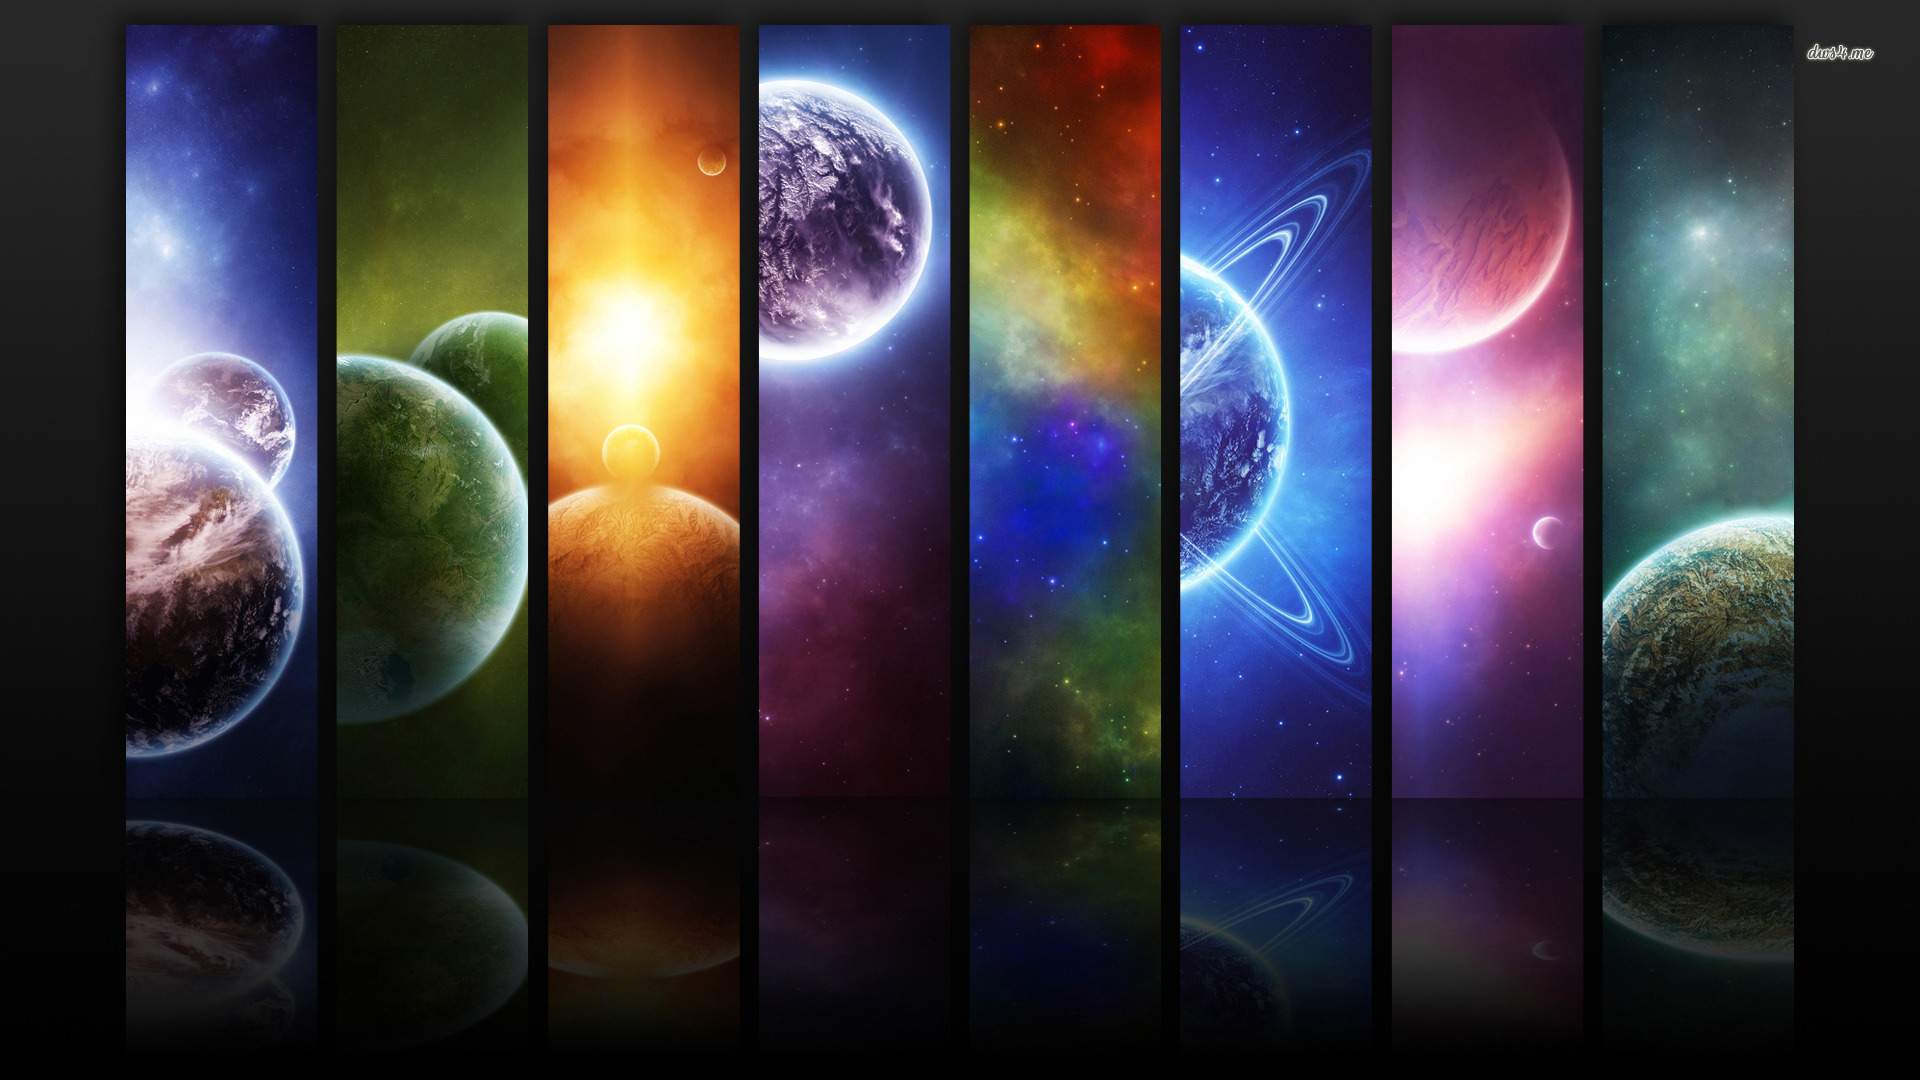 Free Download Solar System Hd Wallpaper Desktop Backgrounds